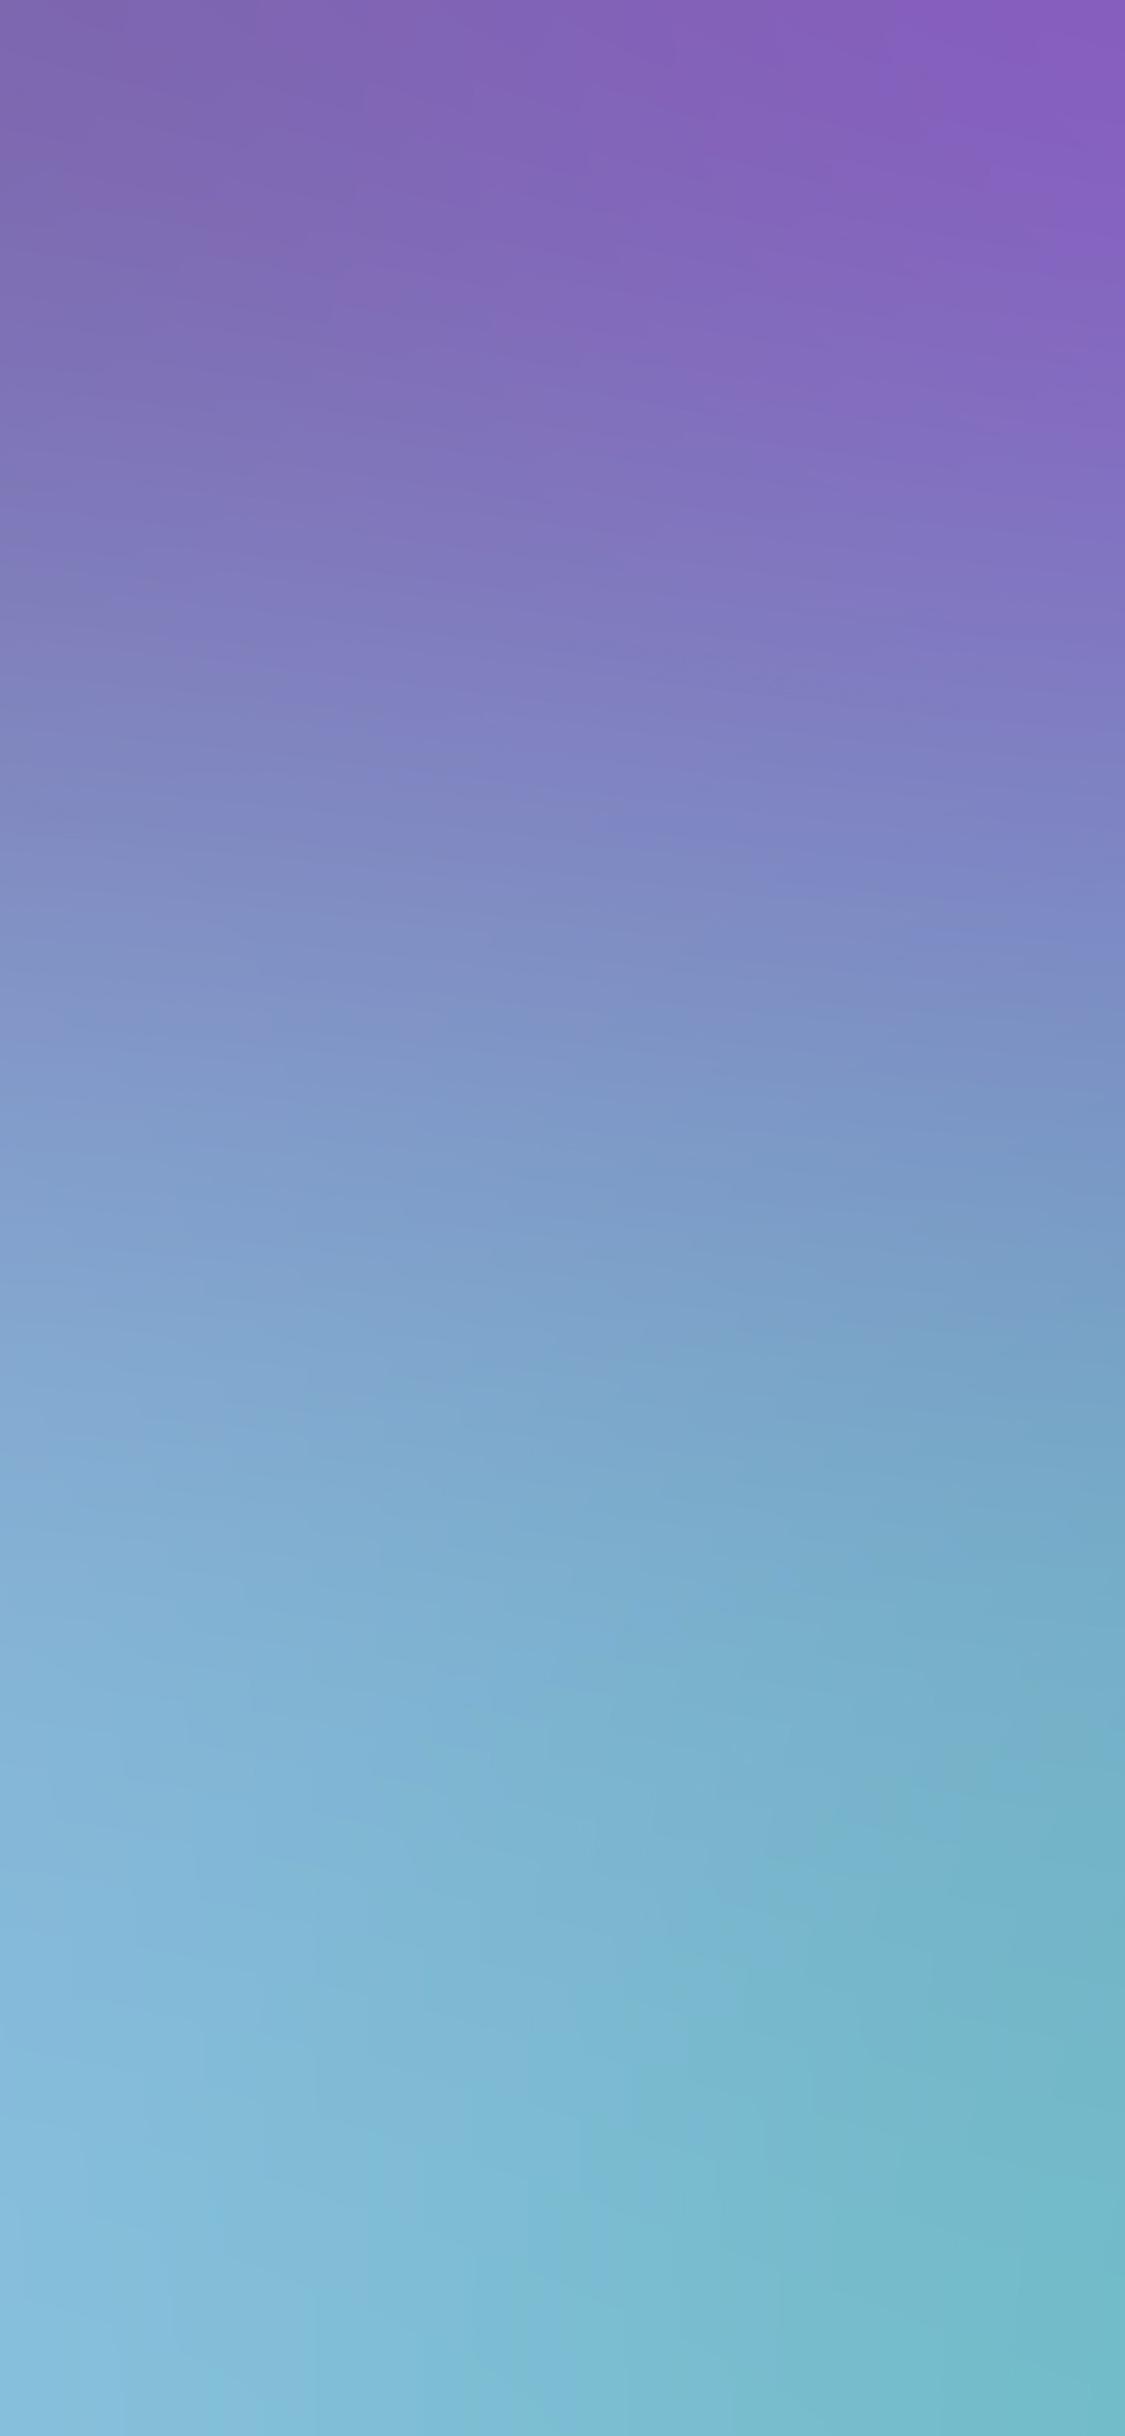 Papersco Iphone Wallpaper Sc53 I Want 5k New Imac Blur